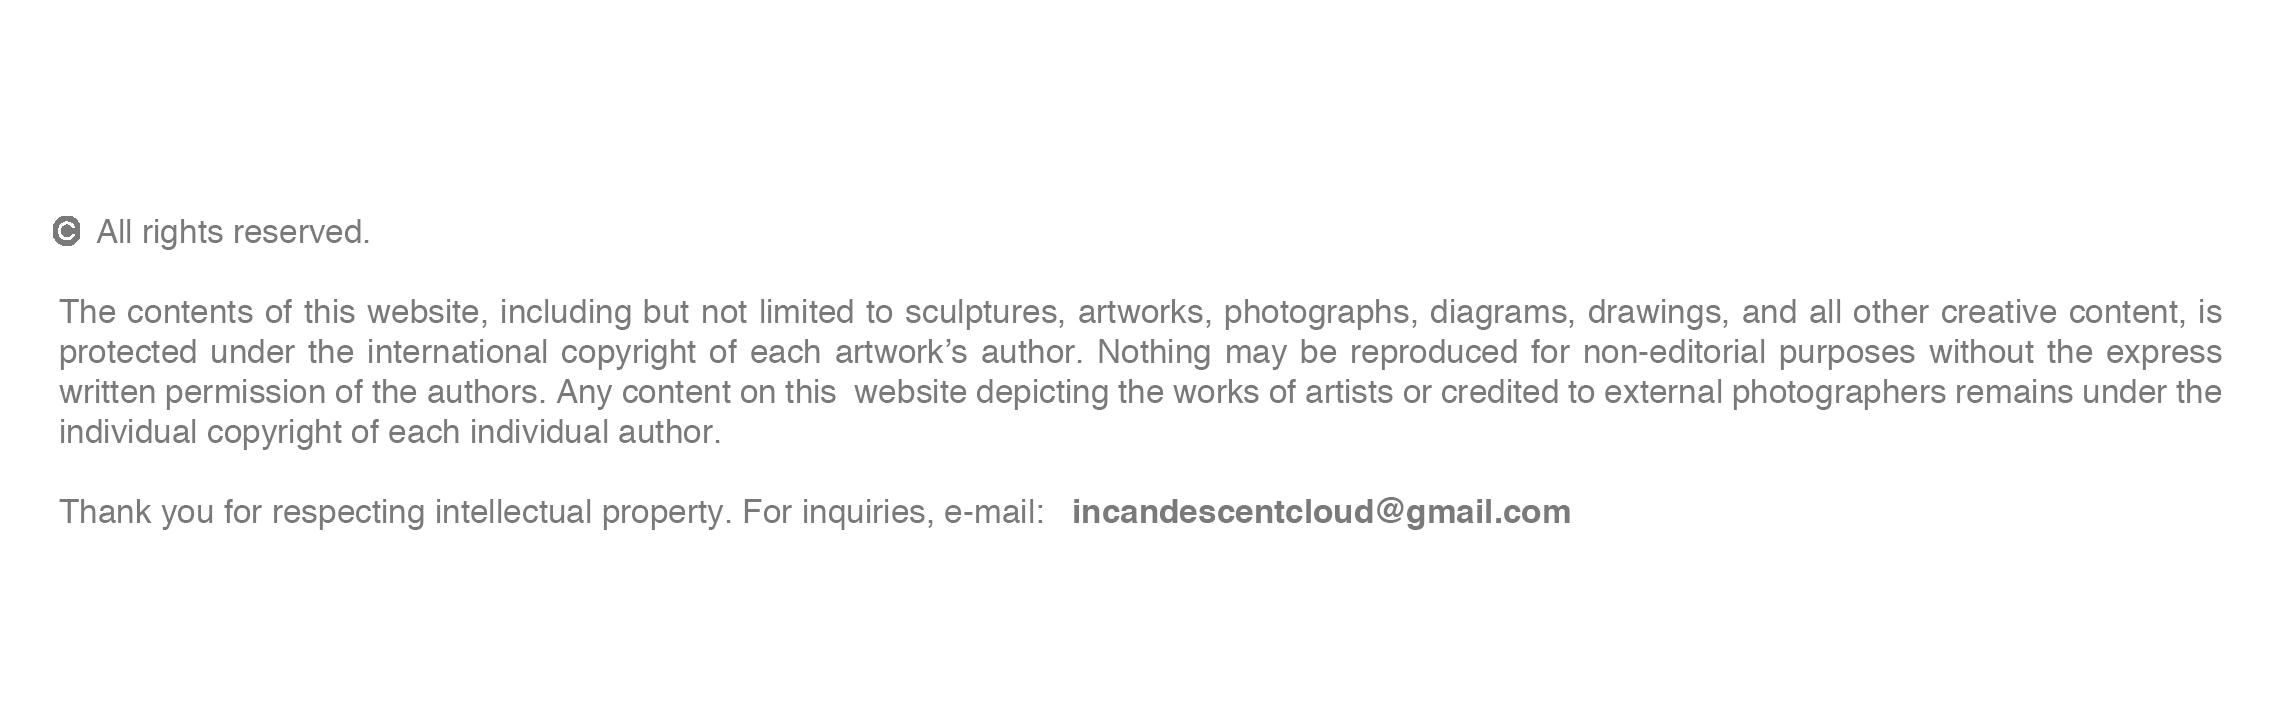 Copyright Statement - Hibernation Project